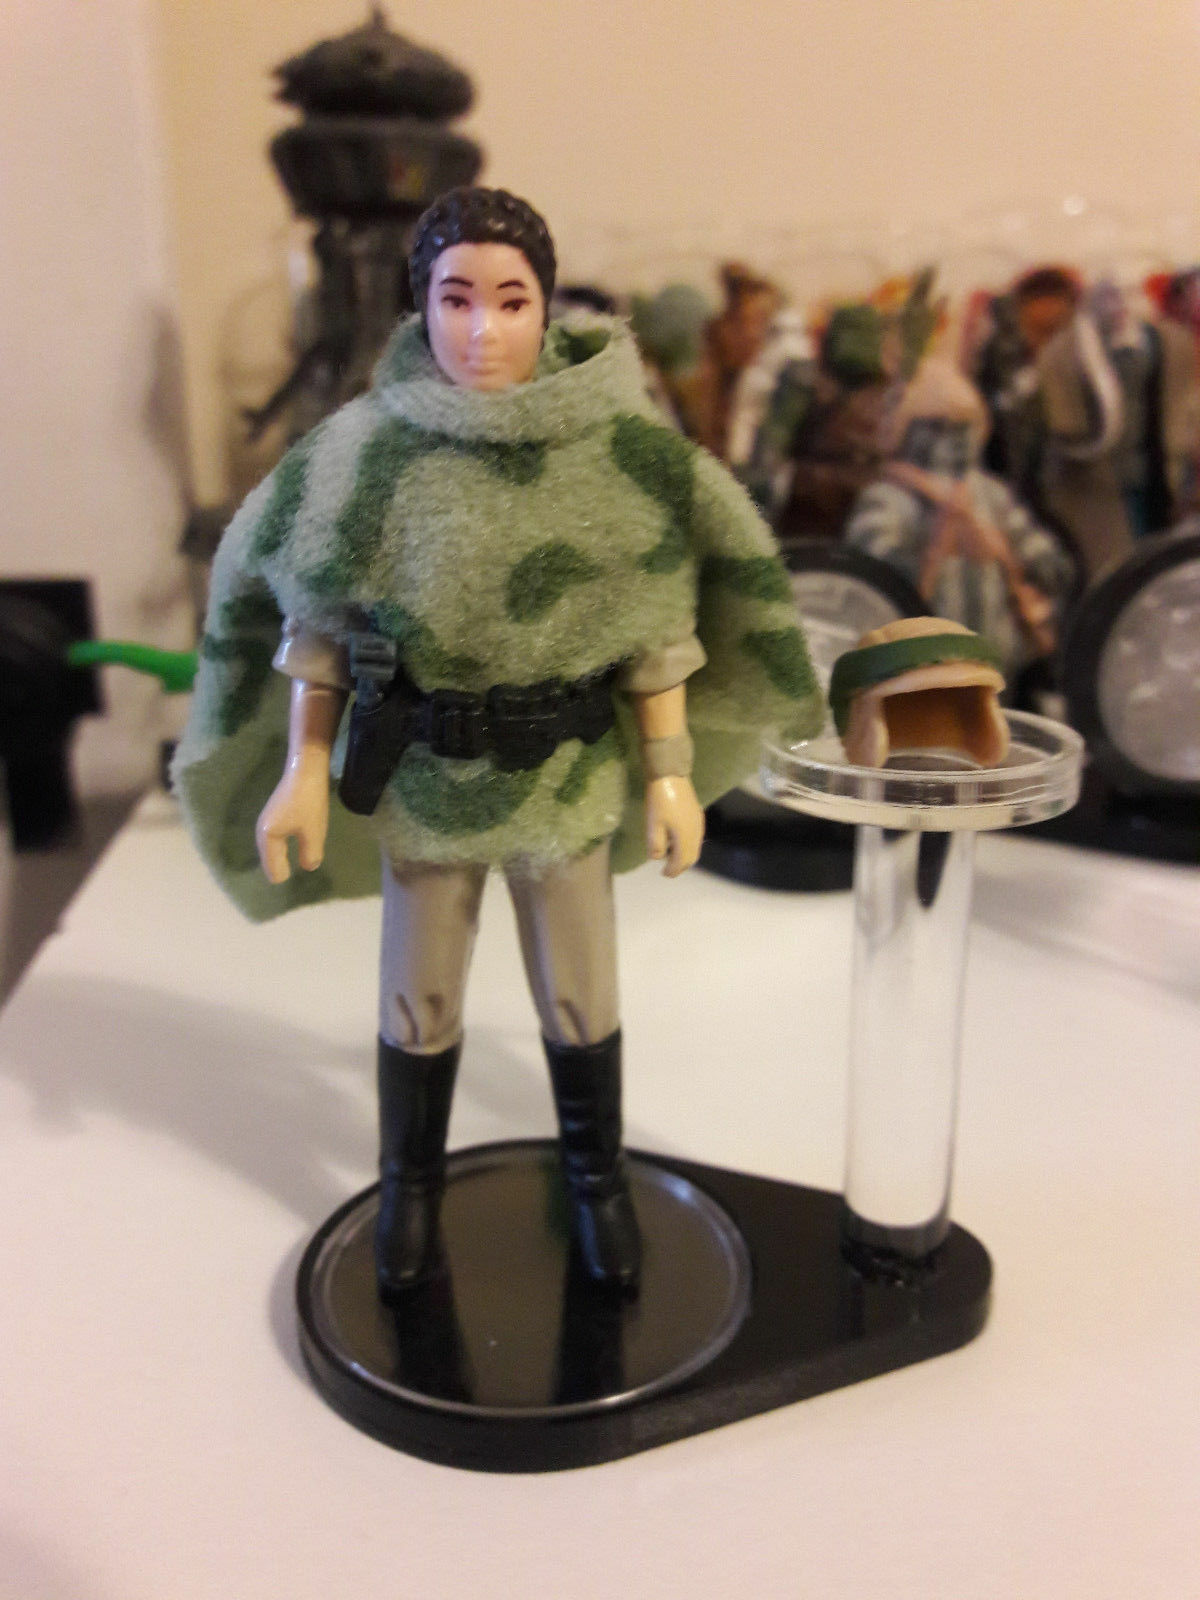 4 x Vintage Star Wars Figure + Helmet Stands - Kenner (DISPLAY STAND ONLY)